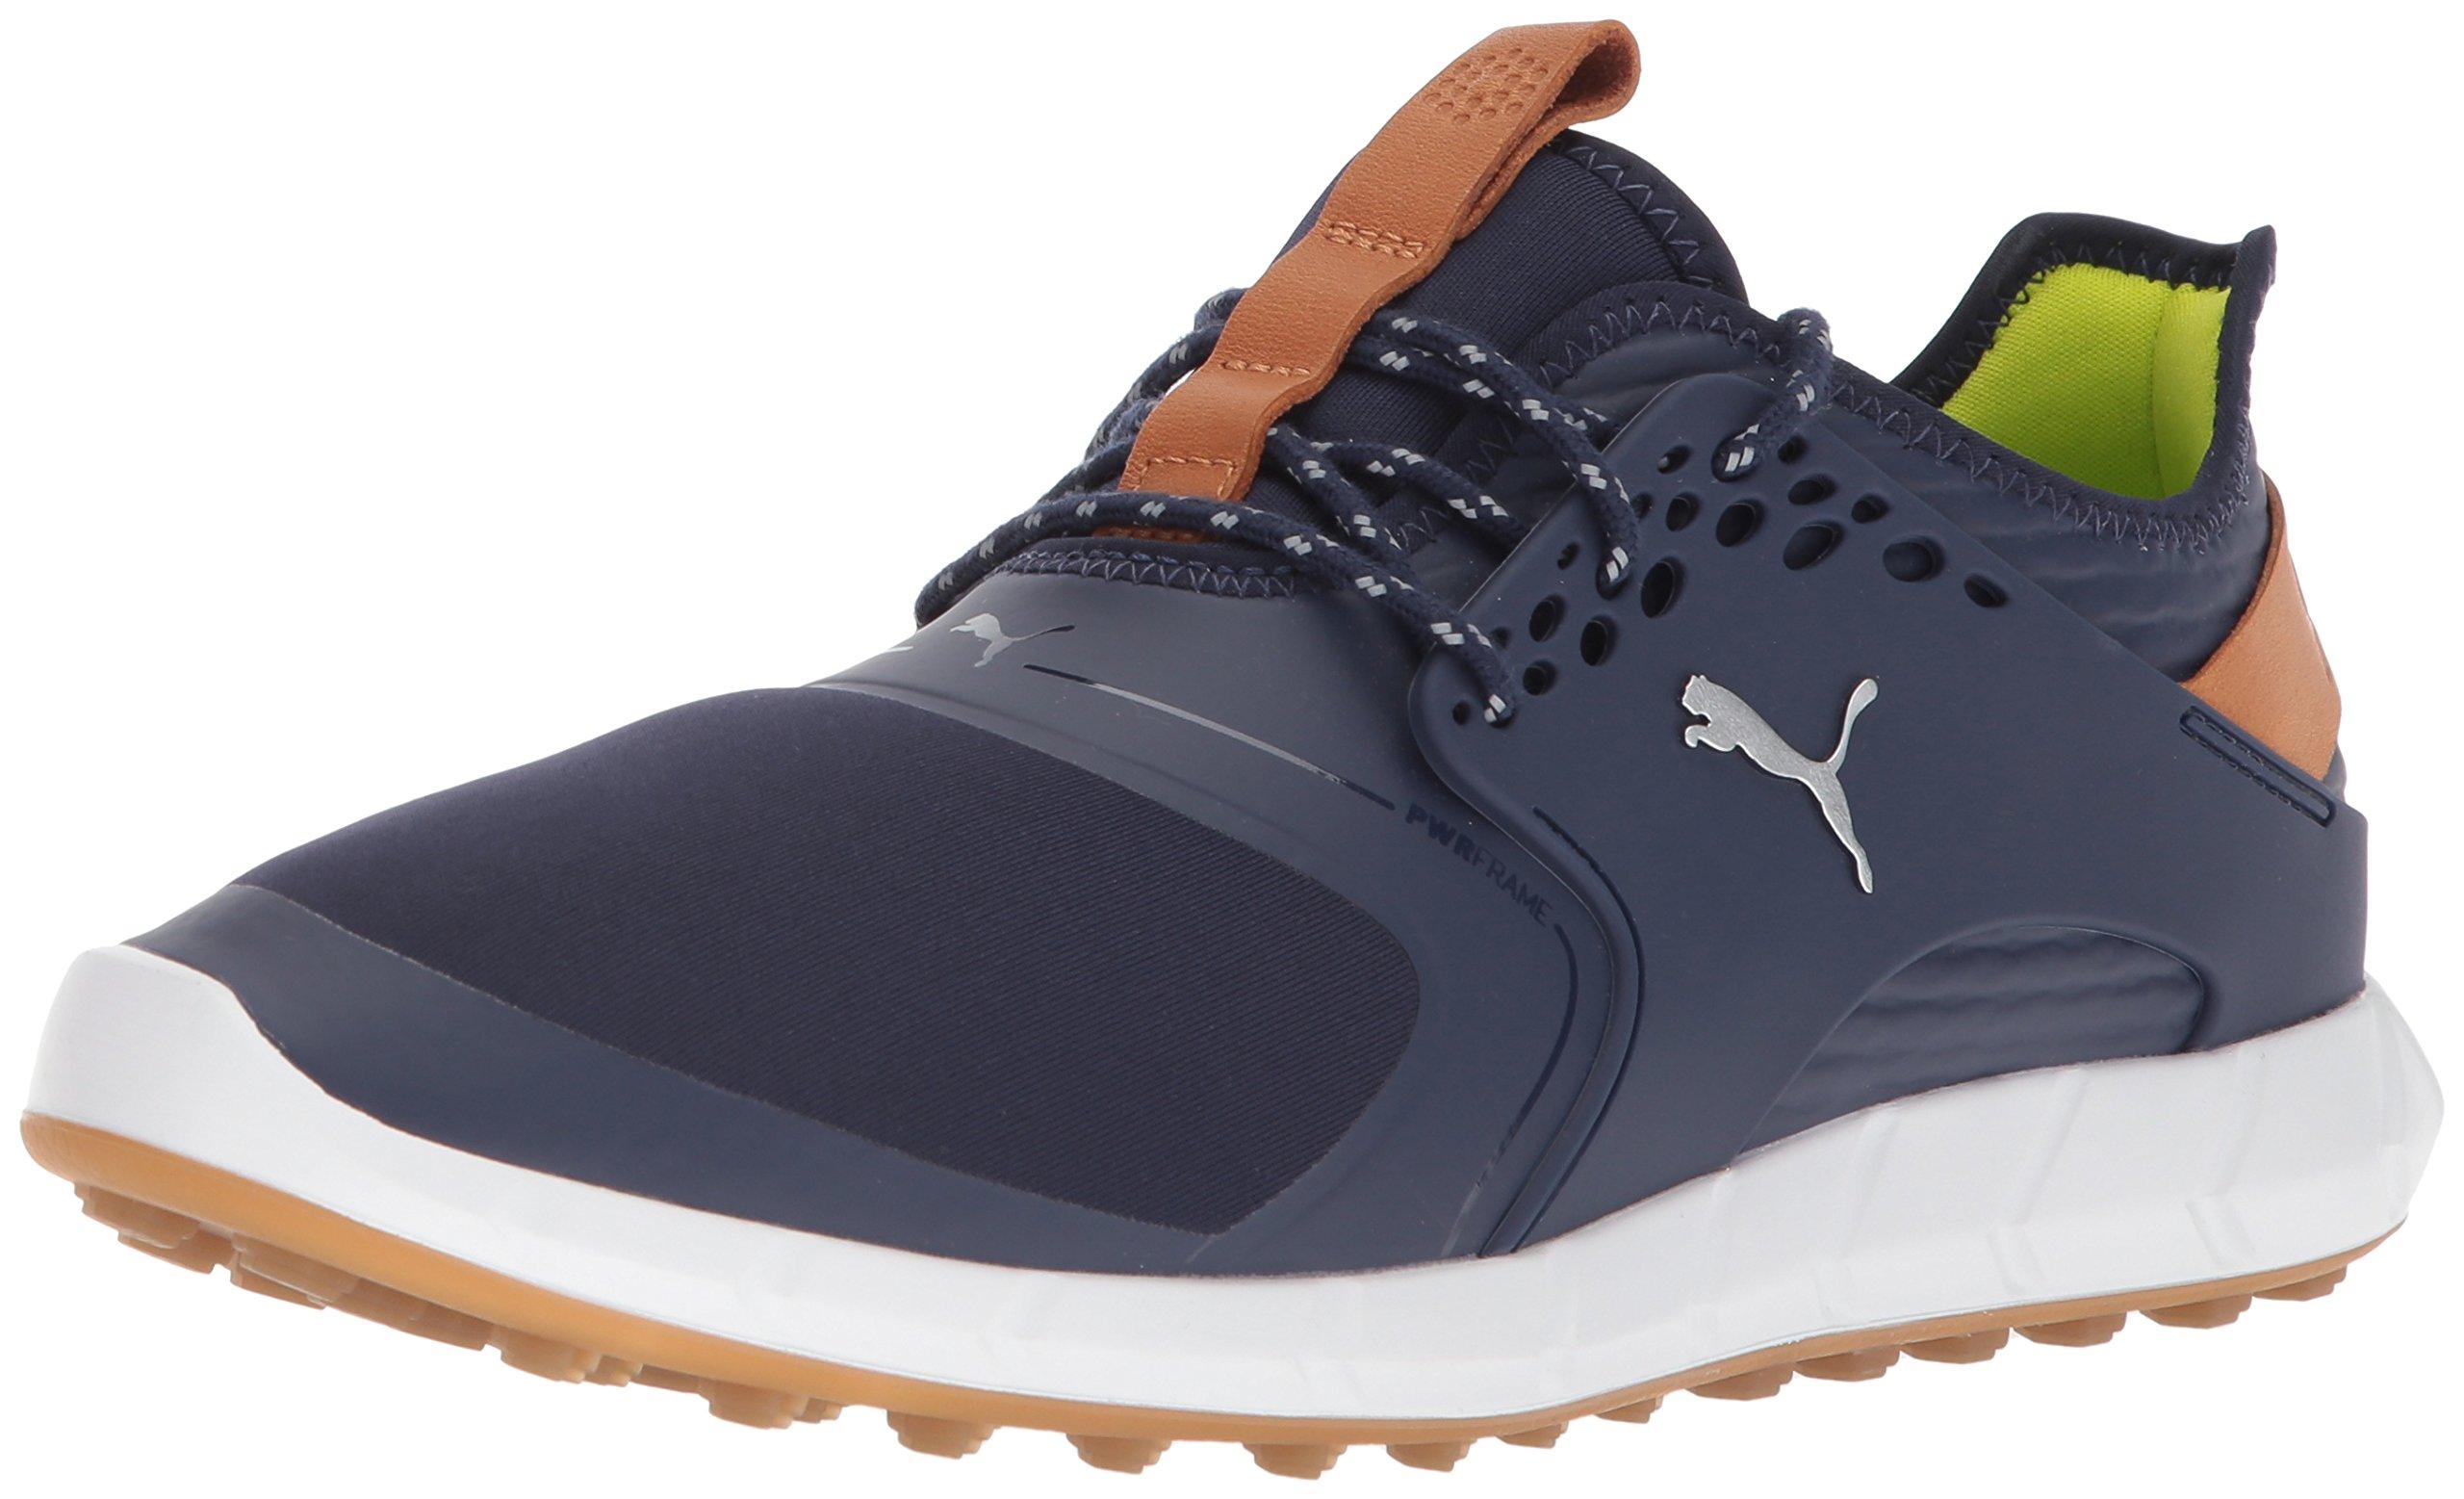 PUMA Golf Men's Ignite Pwrsport Golf Shoe, Peacoat/Silver, 9 Medium US